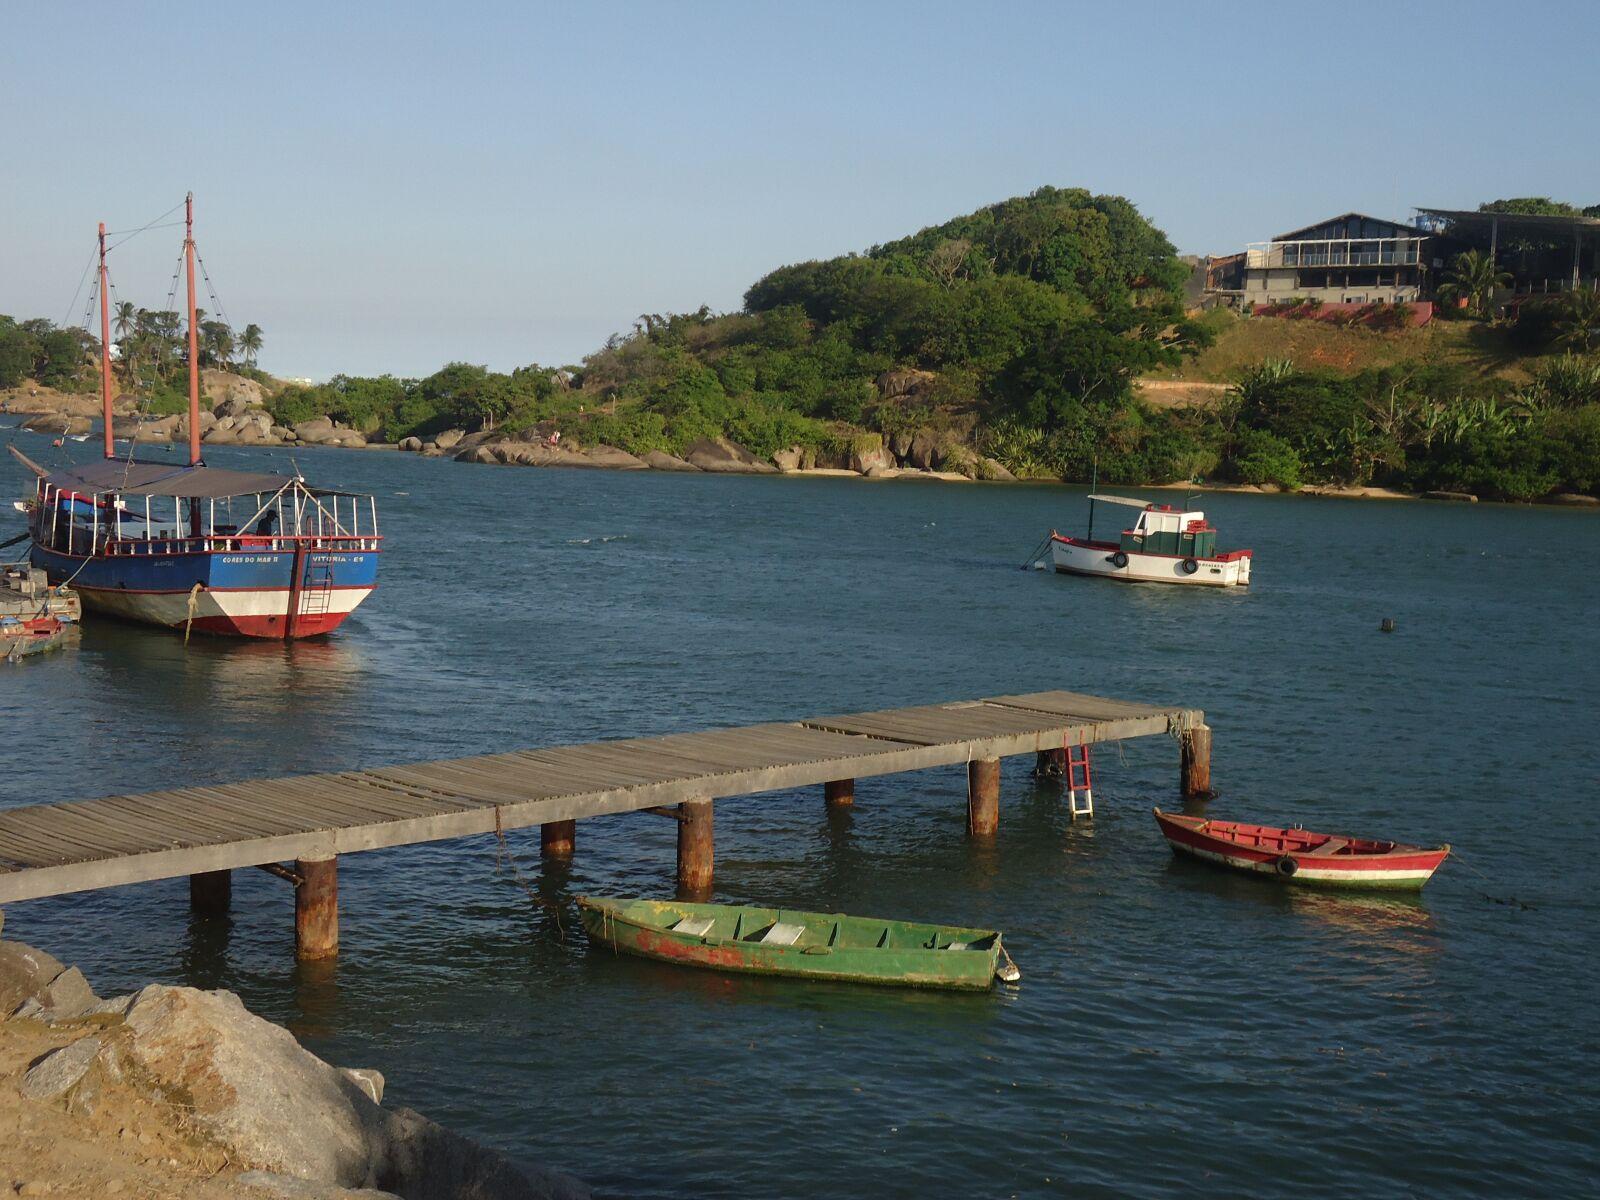 dock, boats, beach